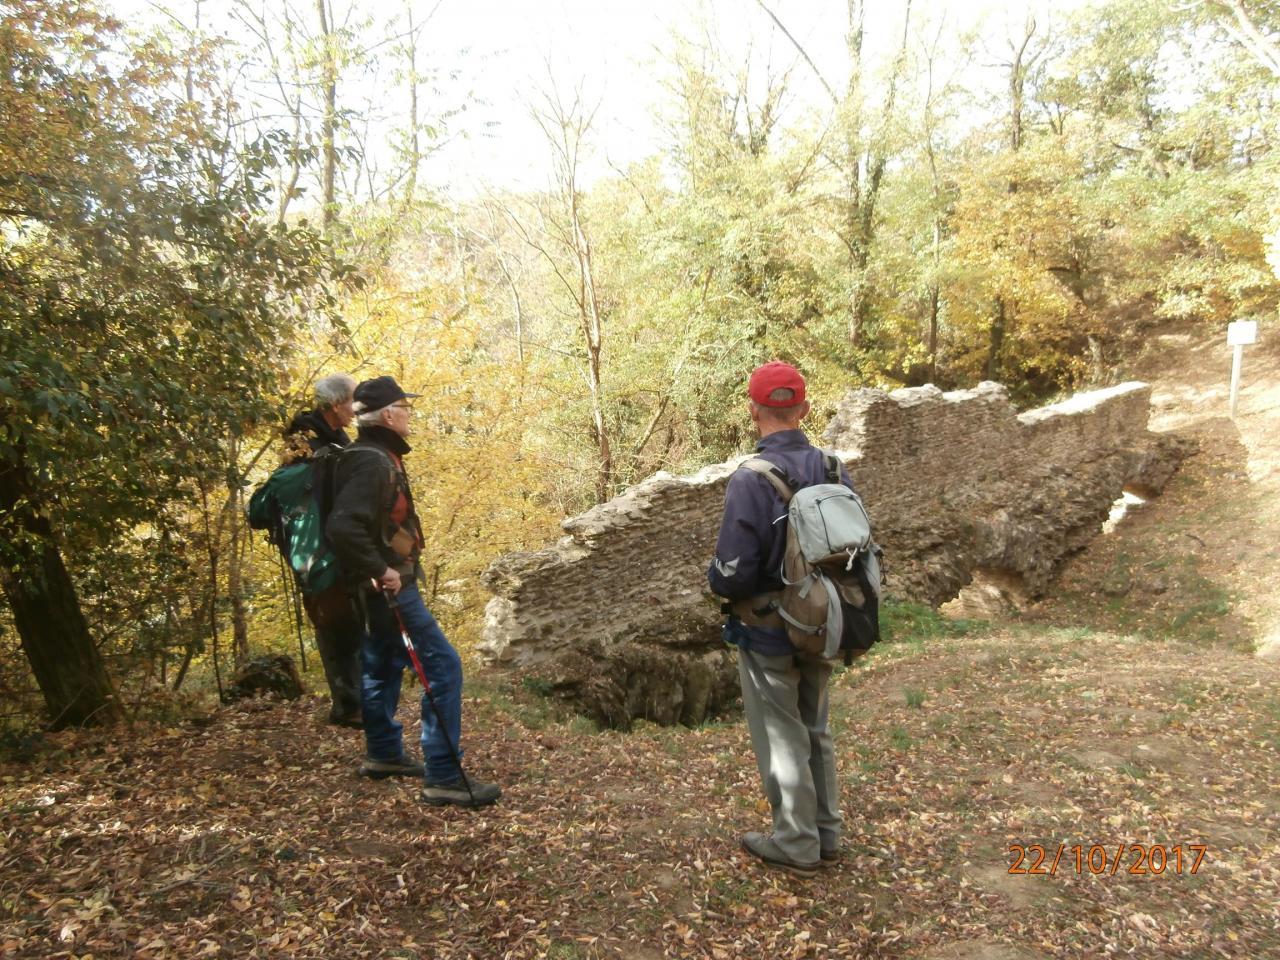 restes de l'aqueduc sur le Bozançon